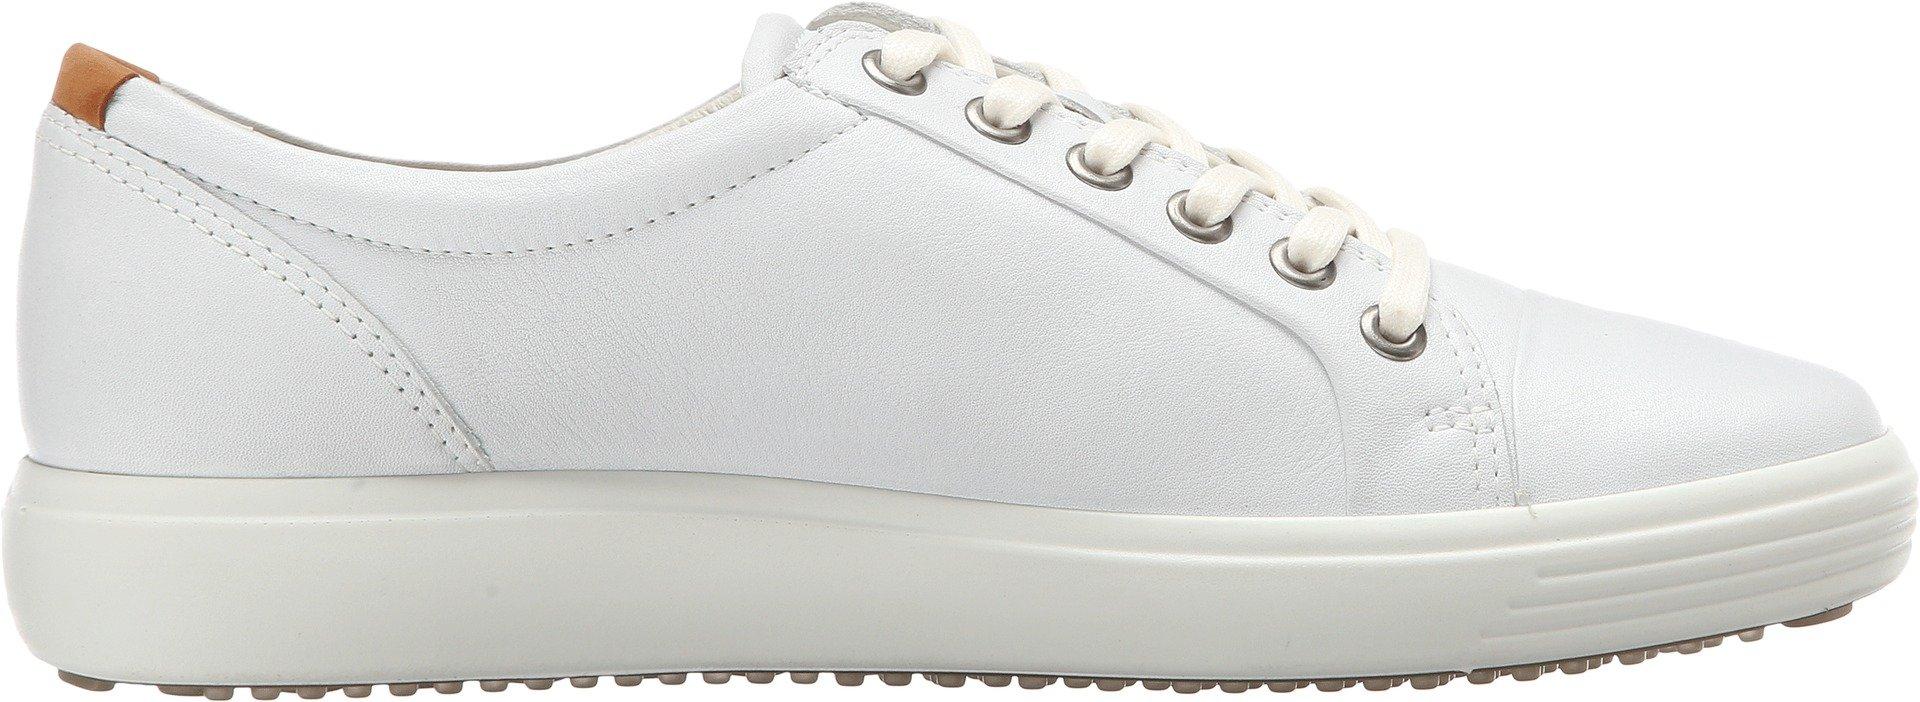 ECCO Footwear Womens Soft VII Fashion Sneaker, White, 37 EU/6-6.5 M US by ECCO (Image #3)